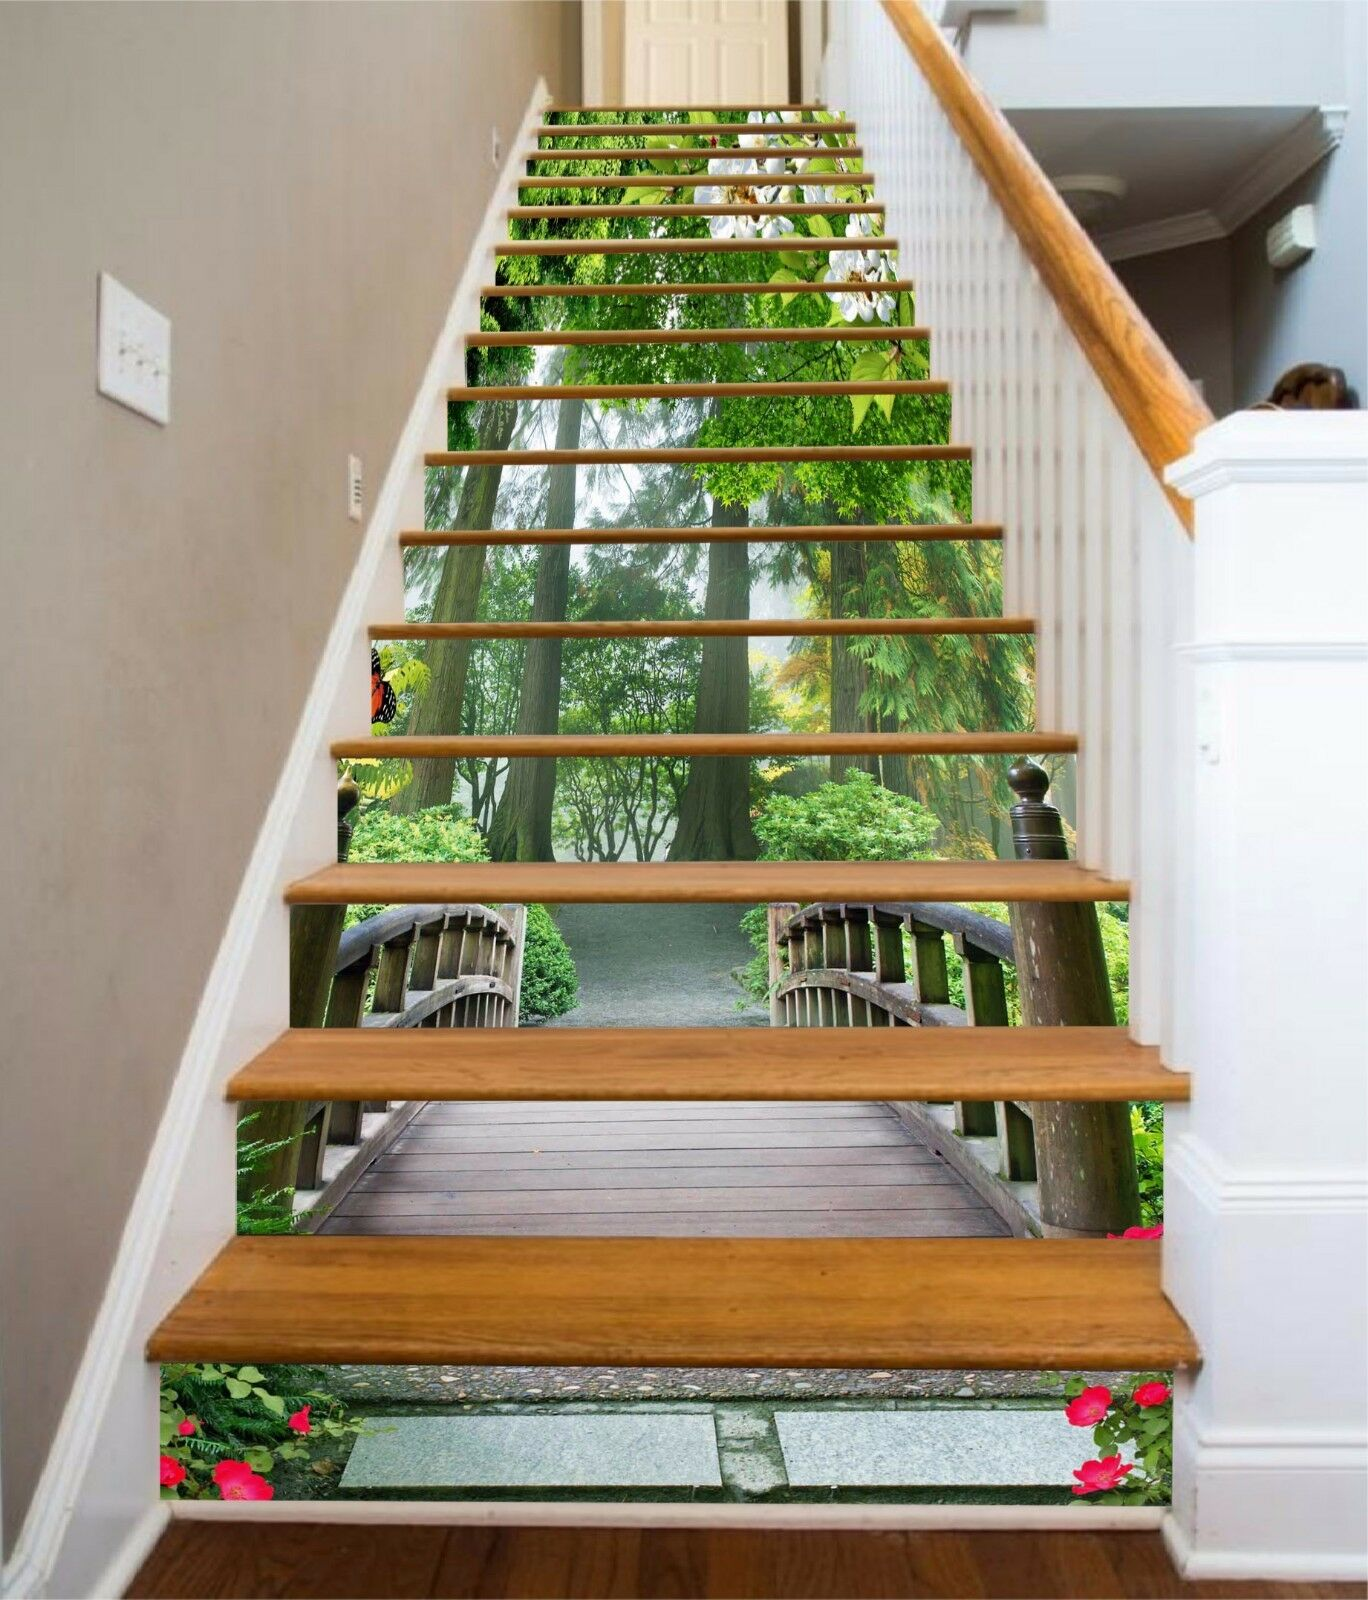 3D Tree bridge 2 Stair Risers Decoration Photo Mural Vinyl Decal Wallpaper UK